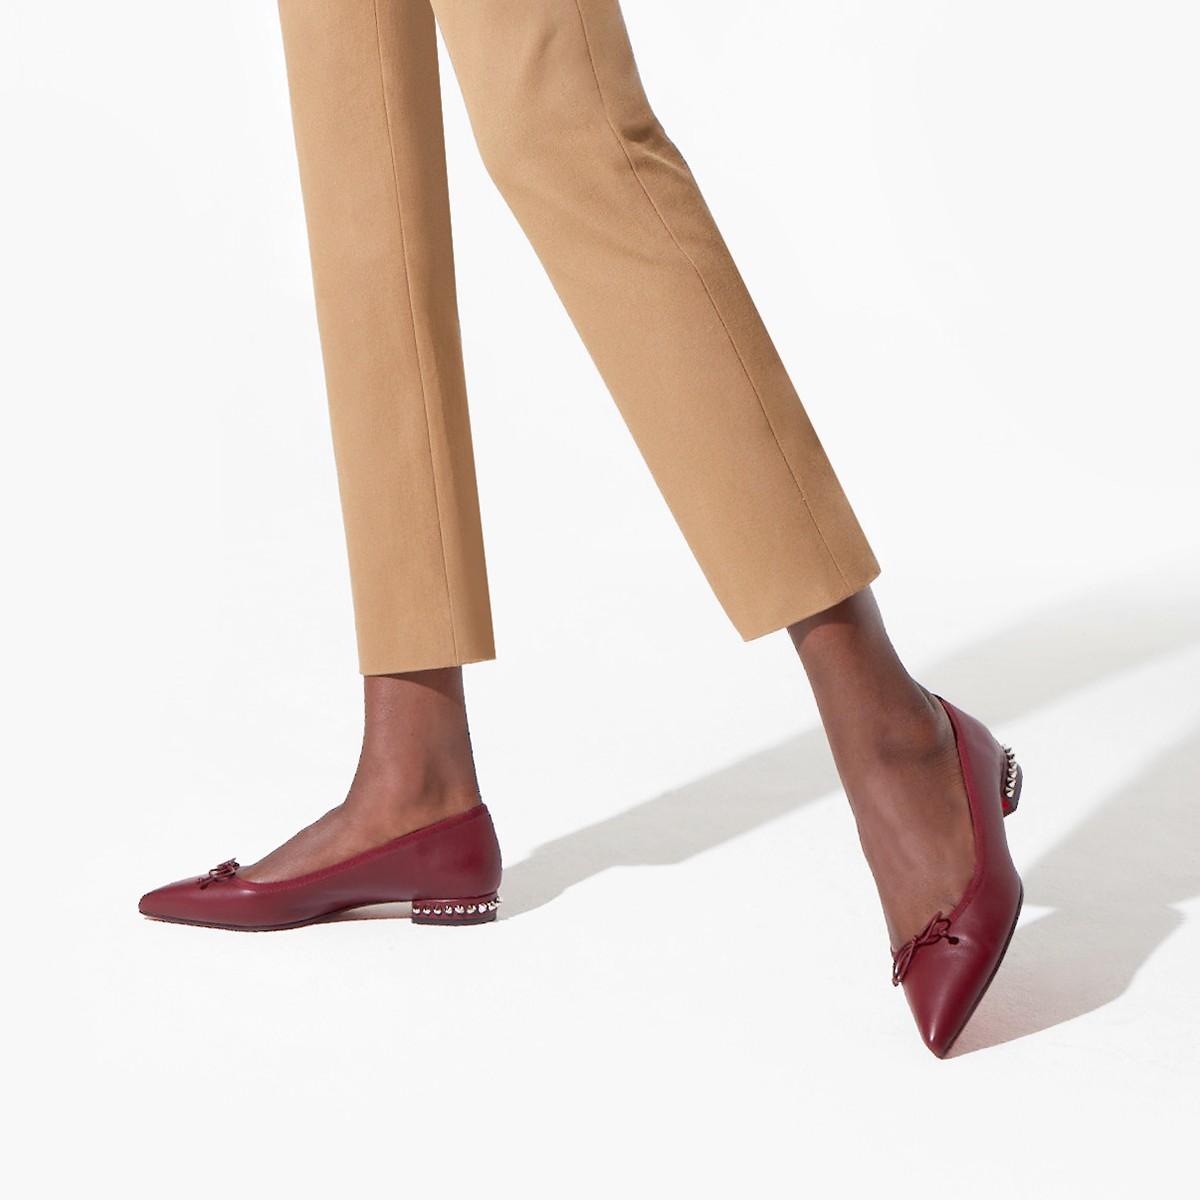 Shoes - Hall Flat - Christian Louboutin